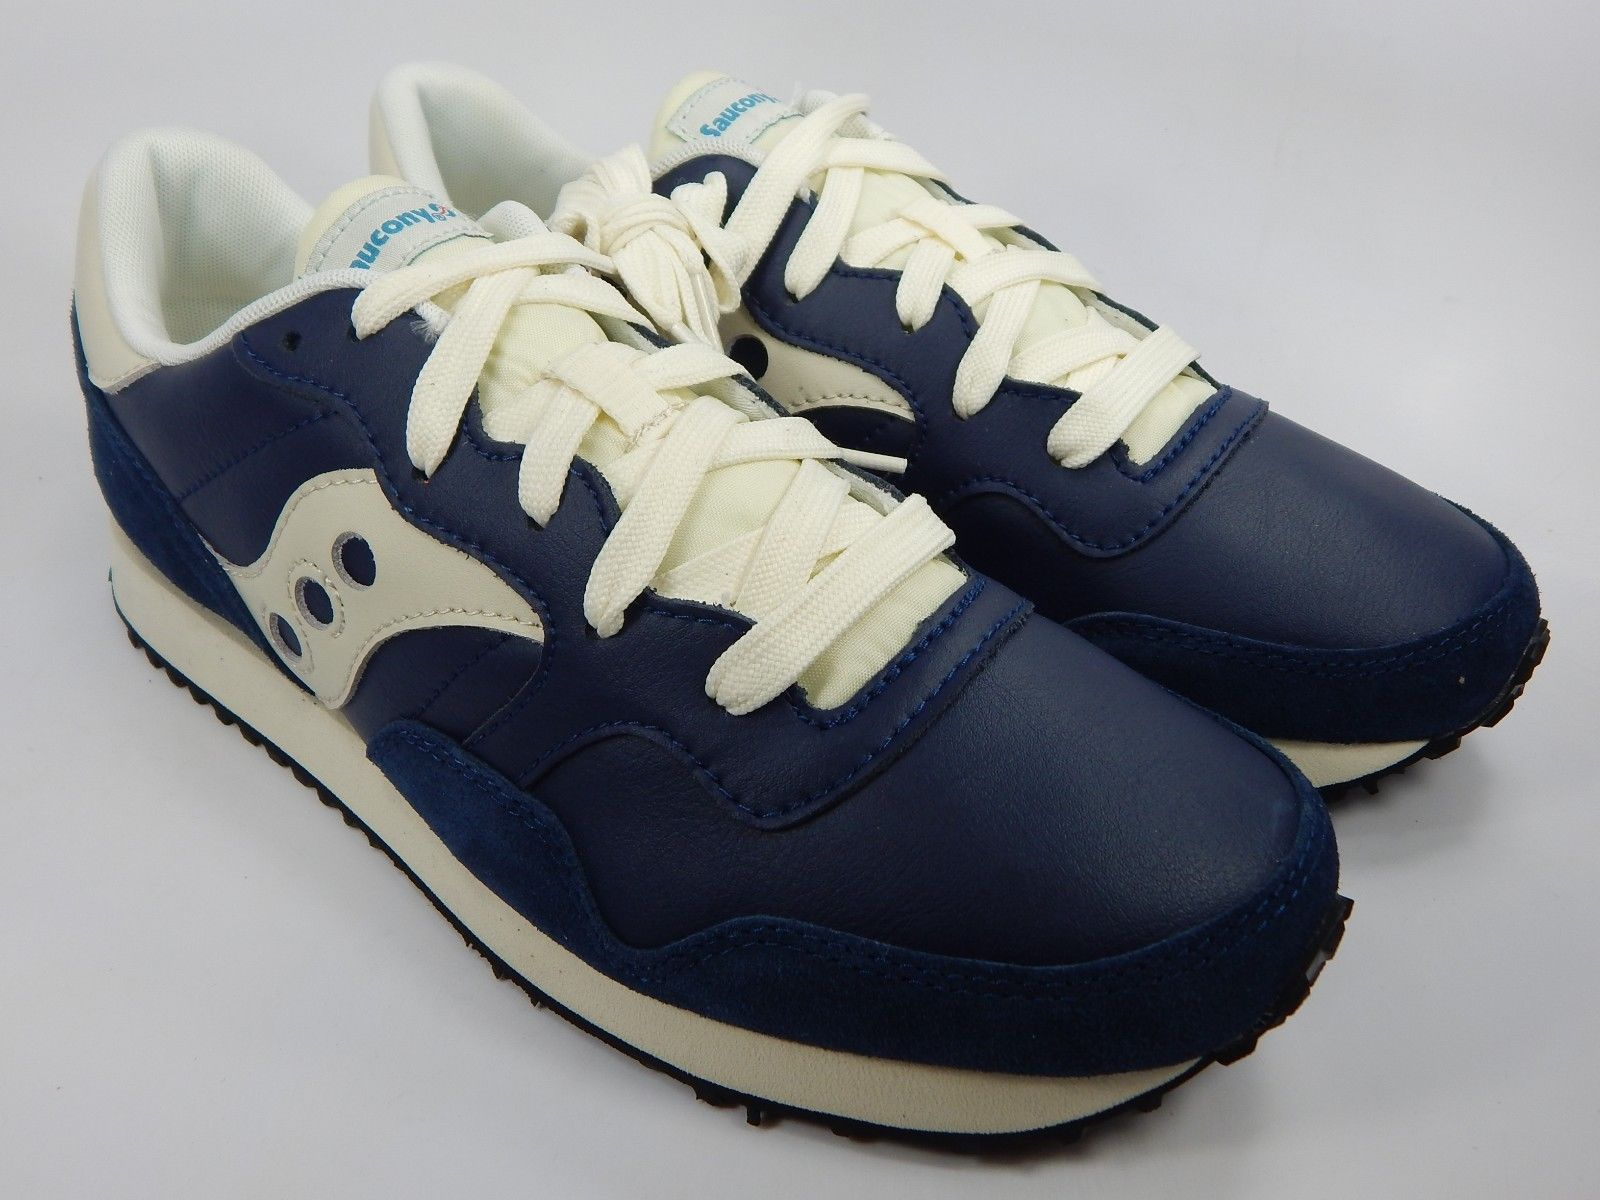 Saucony Originals DXN Trainer CL Men's Running Shoes Sz 9 M (D) EU 42.5 S70358-1